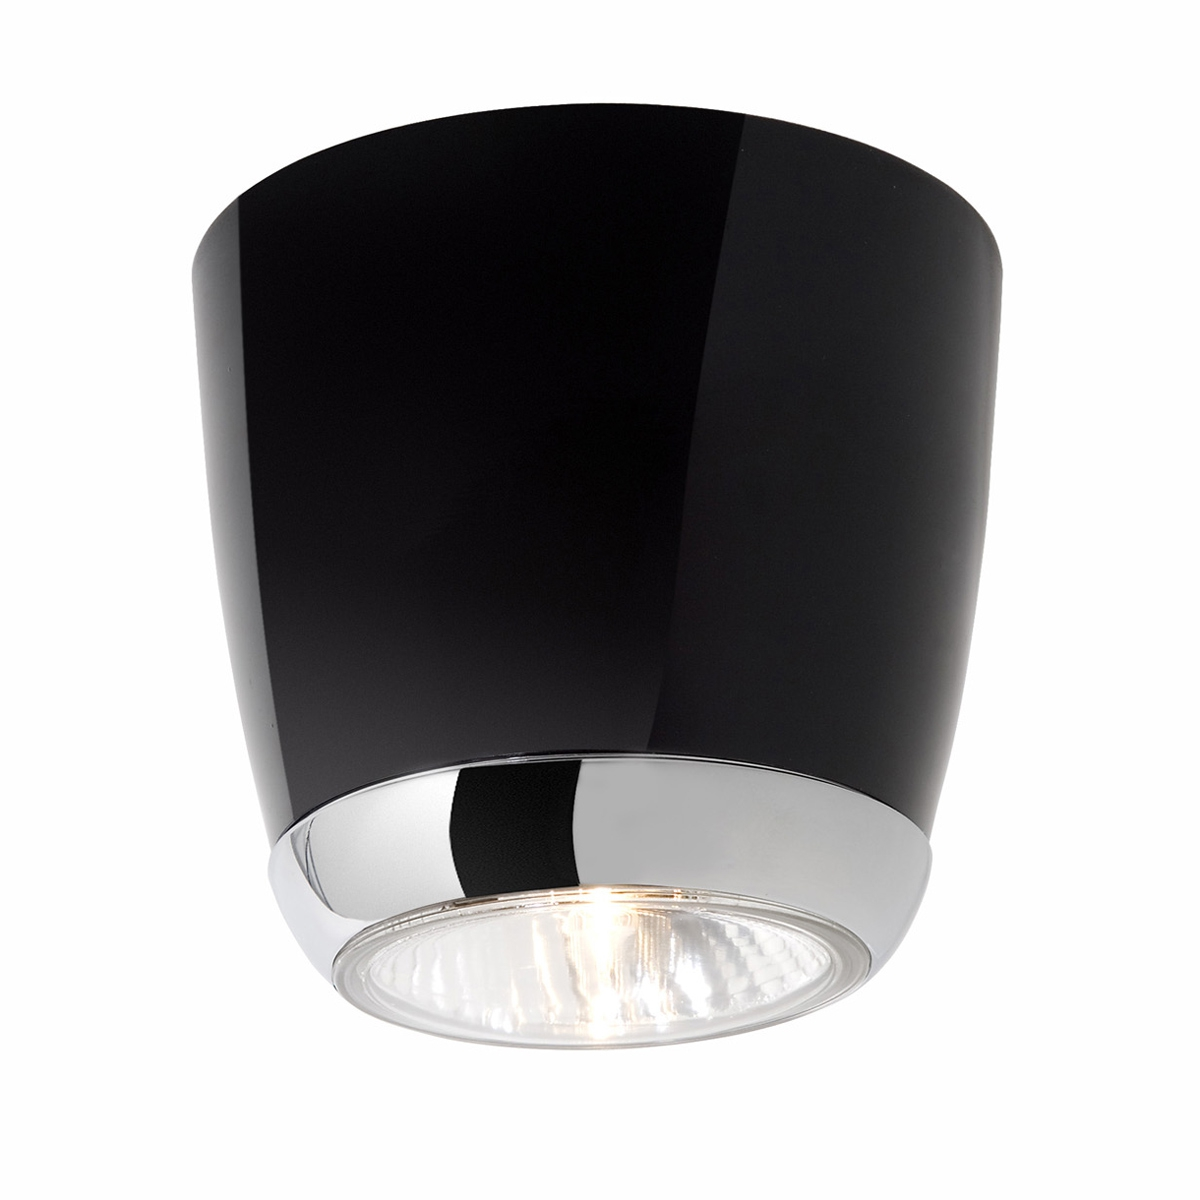 downlight deckenspot im vintage stil der 60er jahre mit reflektor leuchtmittel. Black Bedroom Furniture Sets. Home Design Ideas